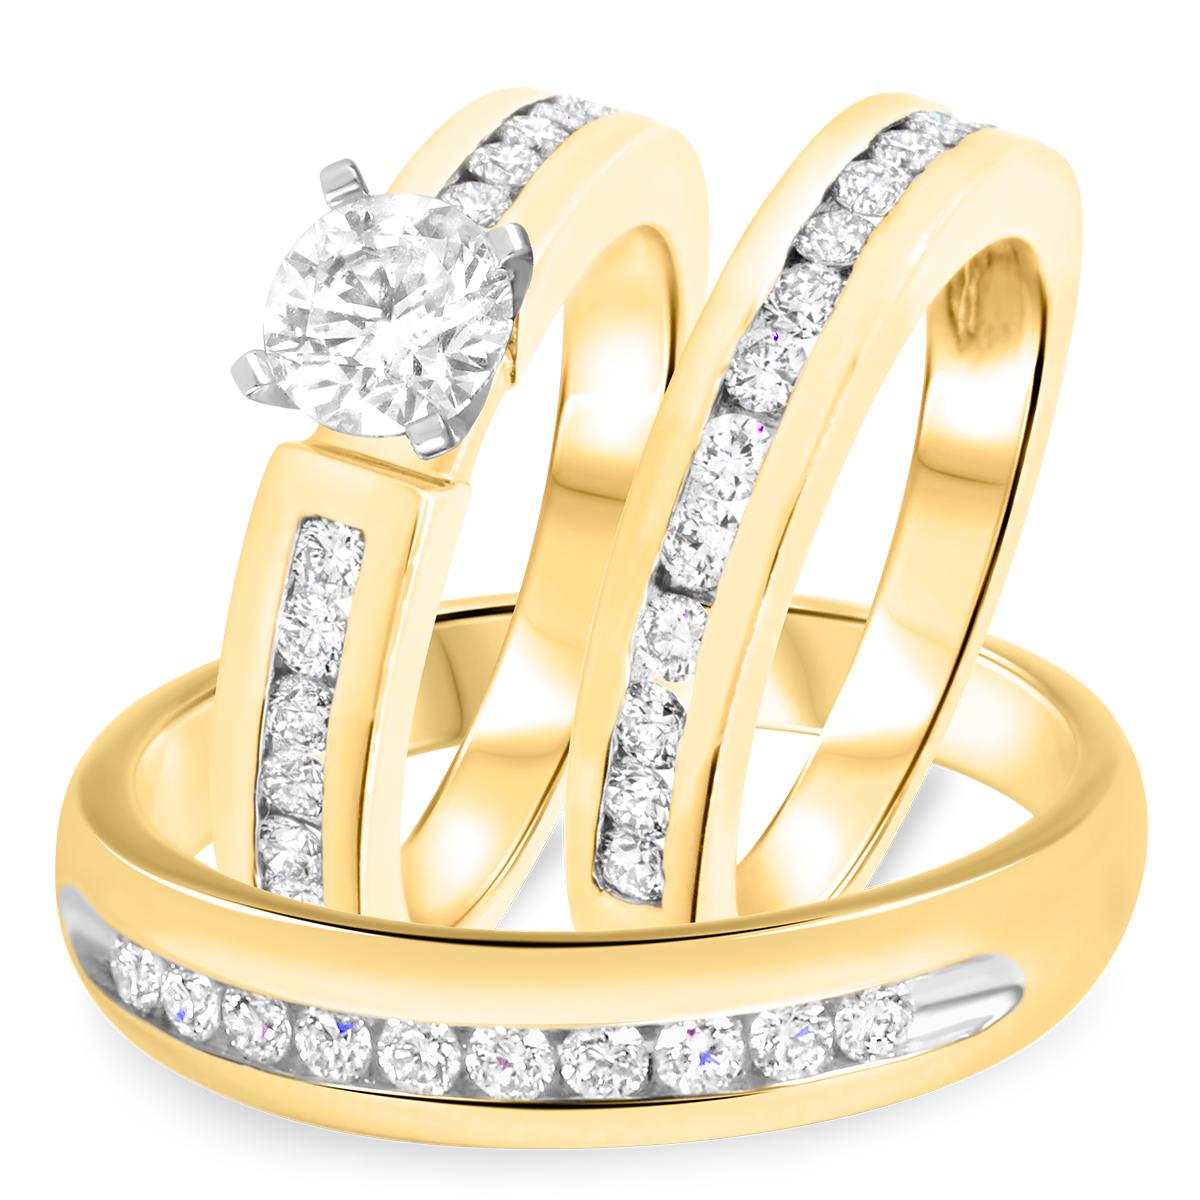 2 1/7 CT. T.W. Diamond Ladies Engagement Ring, Wedding Band, Men's Wedding Band